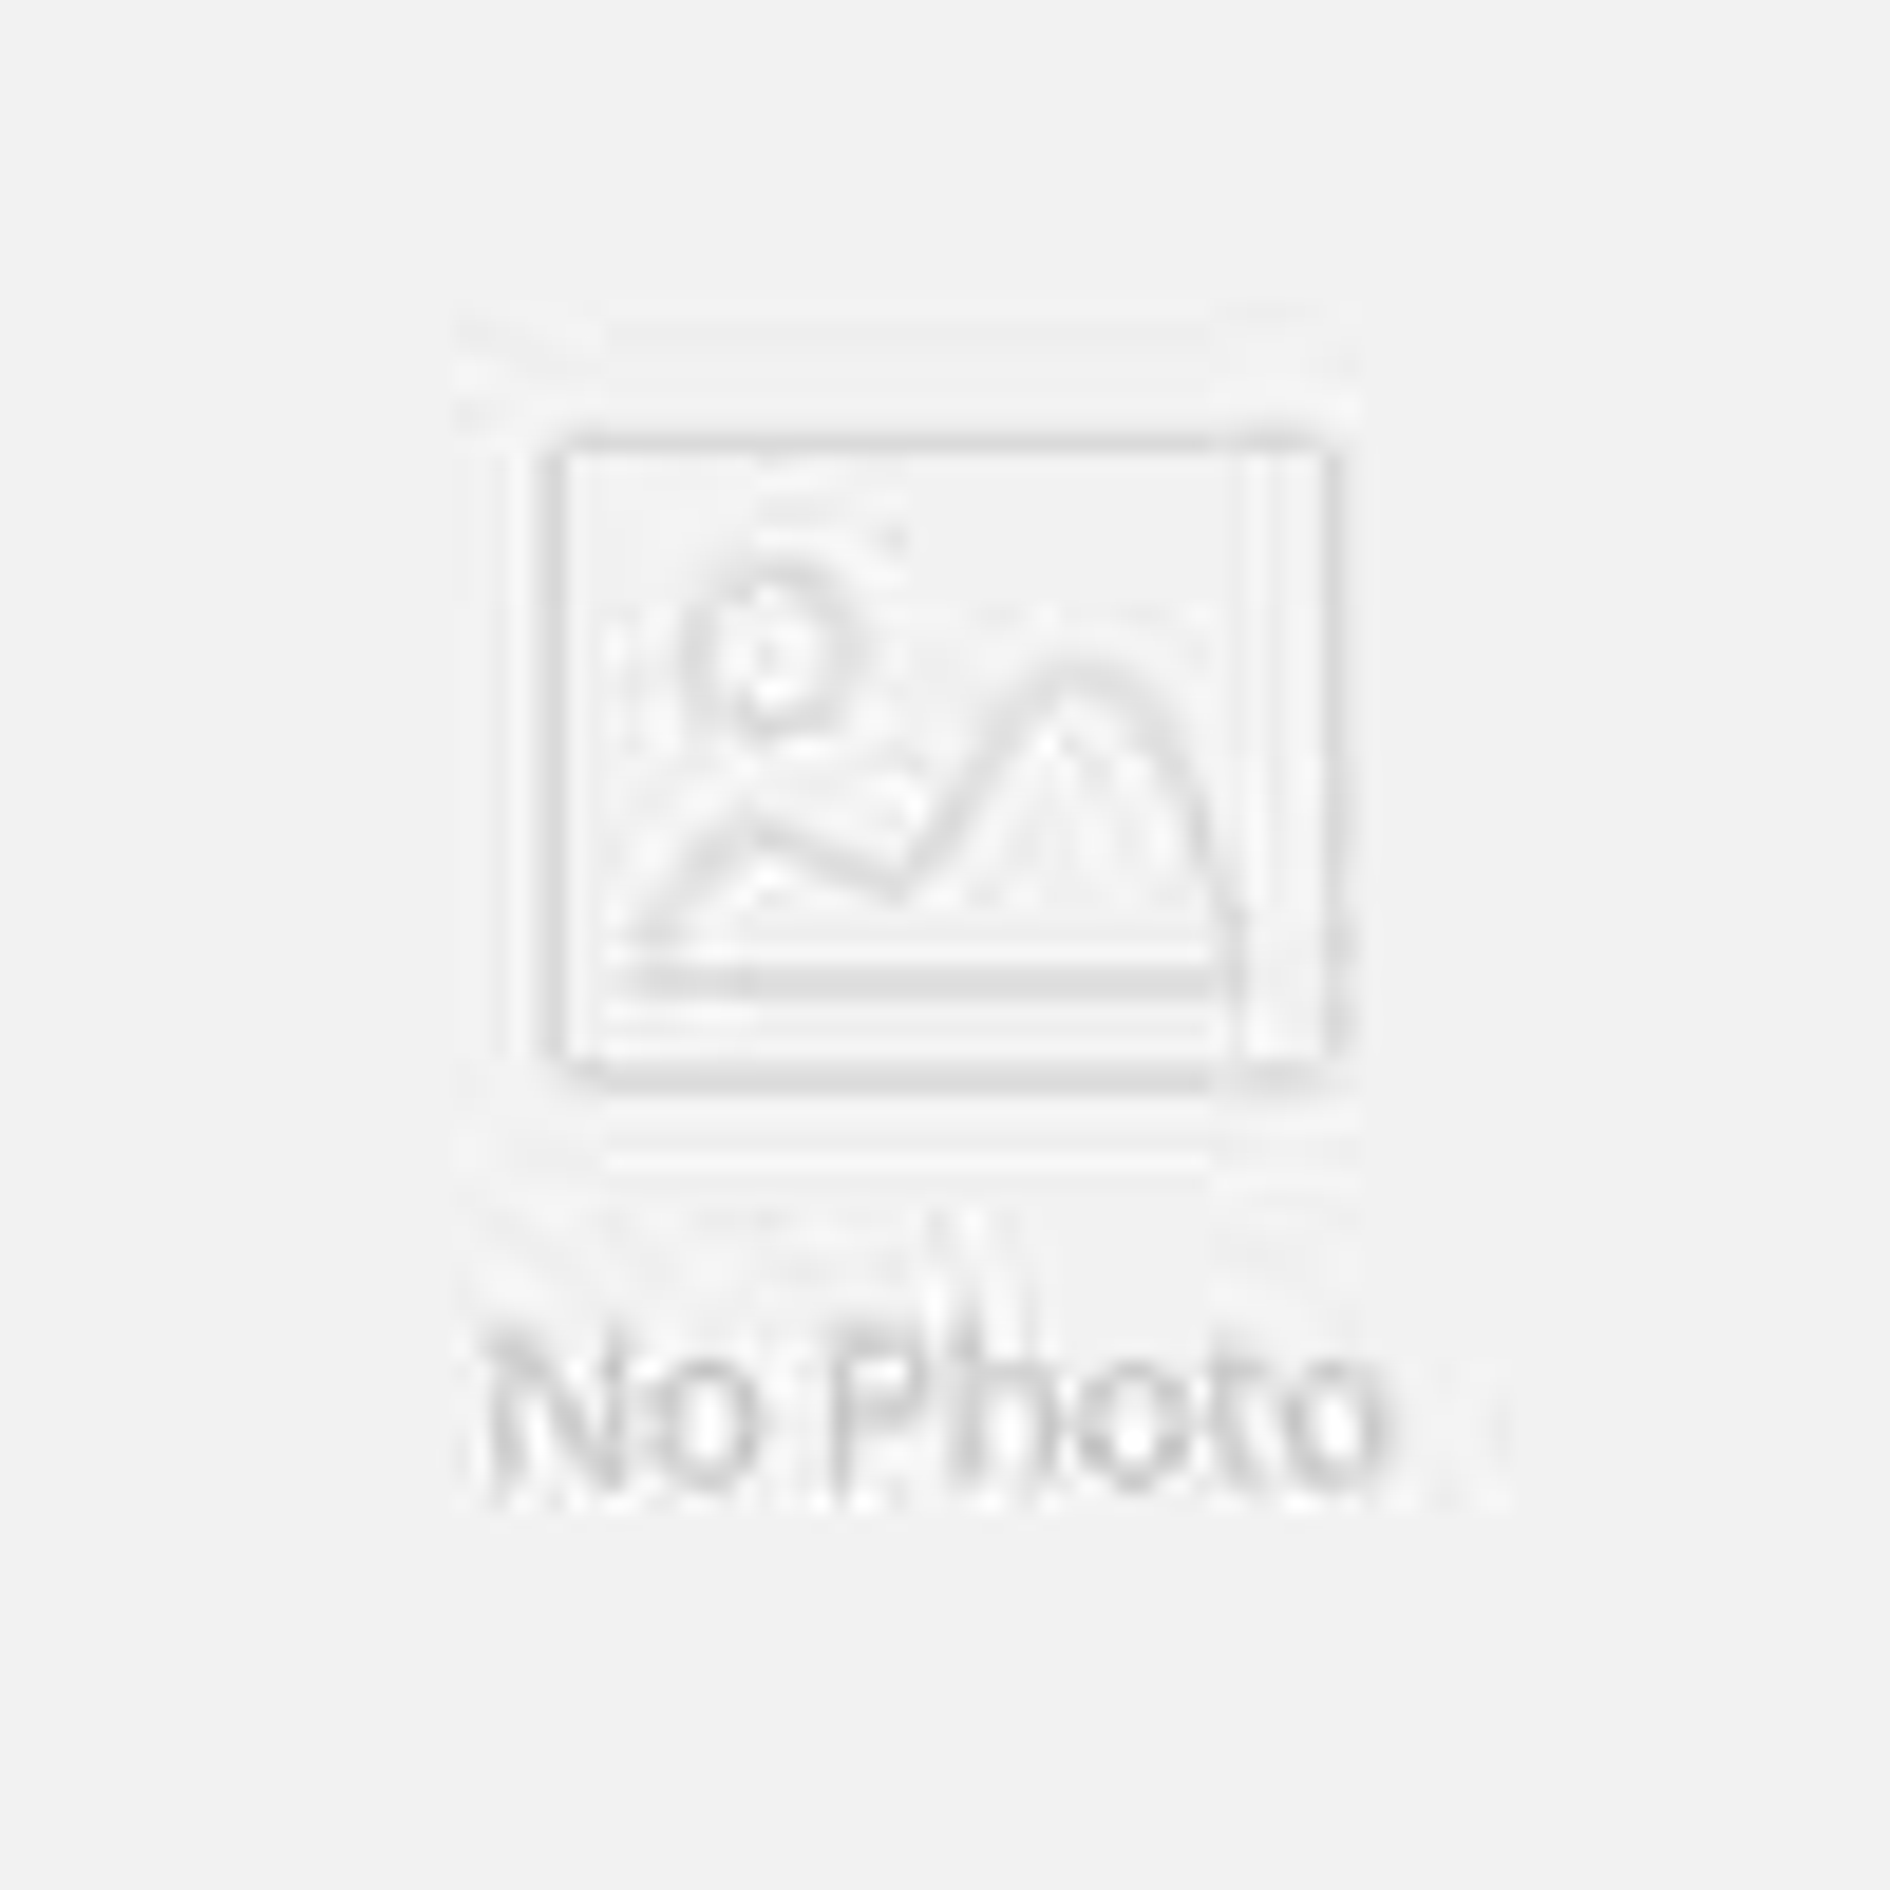 Hot selling and X-26 Intel c1037u Celeron Dual core Multi computing Thin clients linux mini pc vga 2gb ram 16gb ssd(China (Mainland))